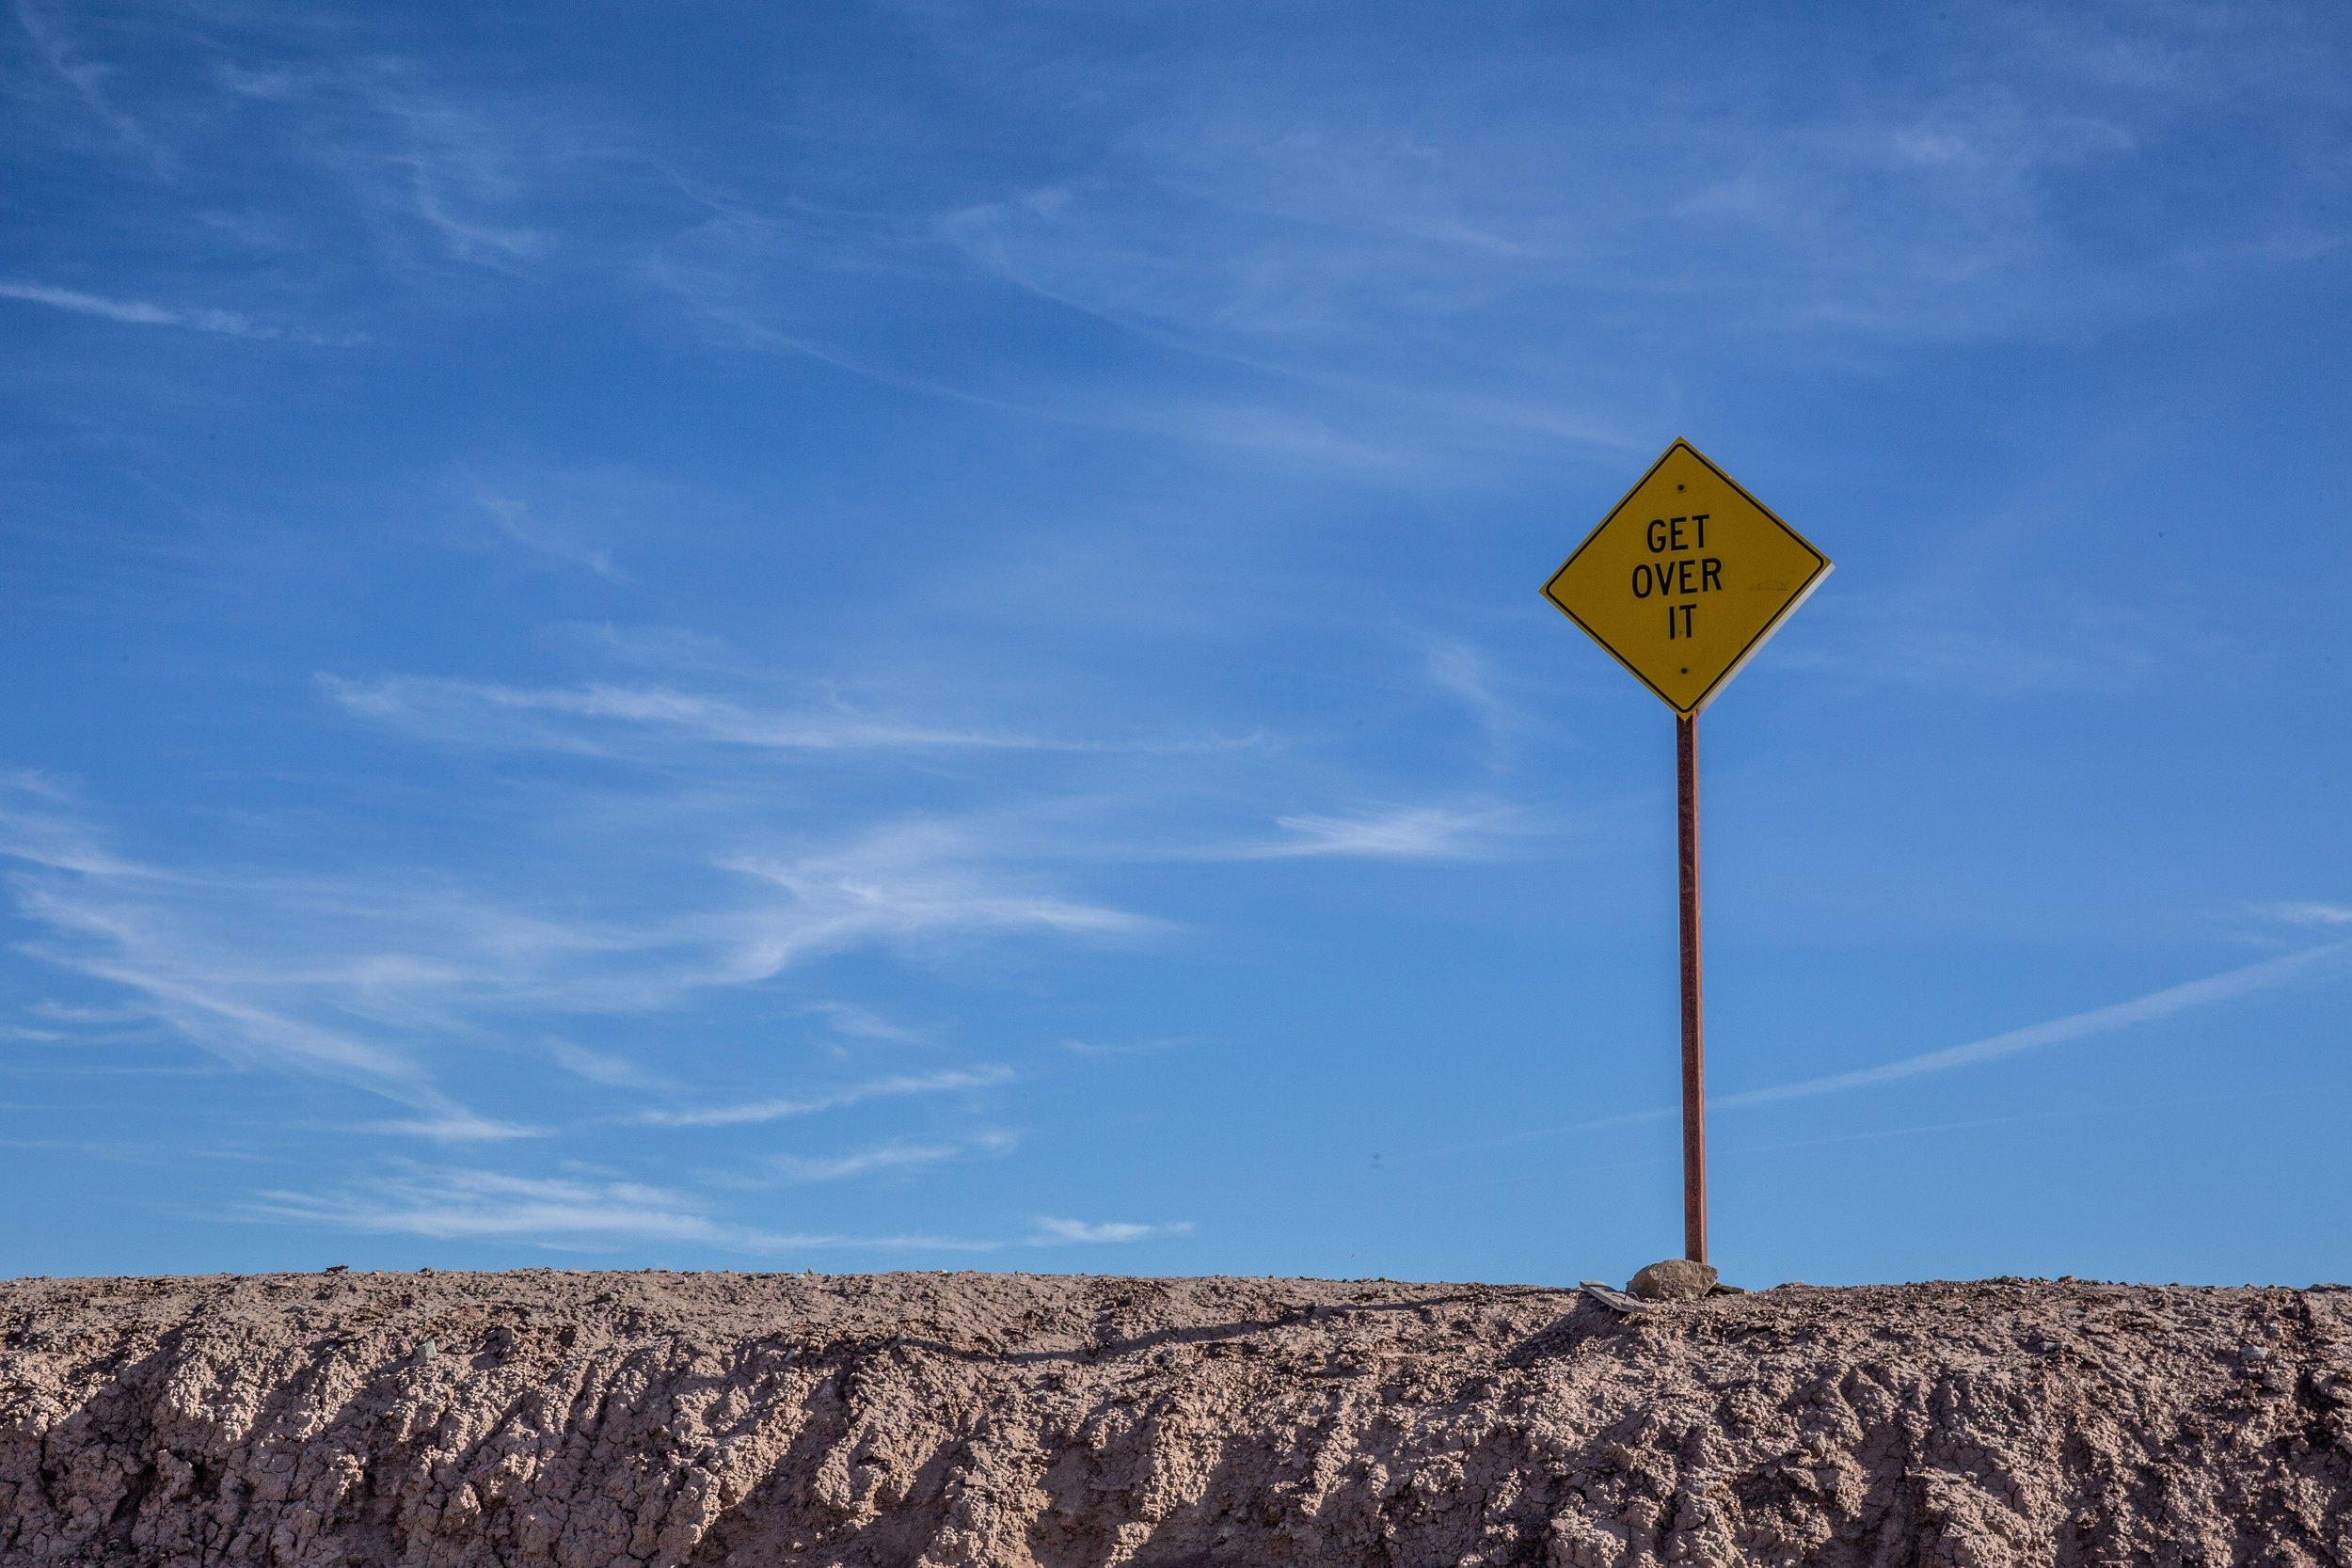 Get Over It_PDA_Olivia Steele. BBB_Salton Sea_photo by_ Nicolas De Panam_March 2019_01.jpeg